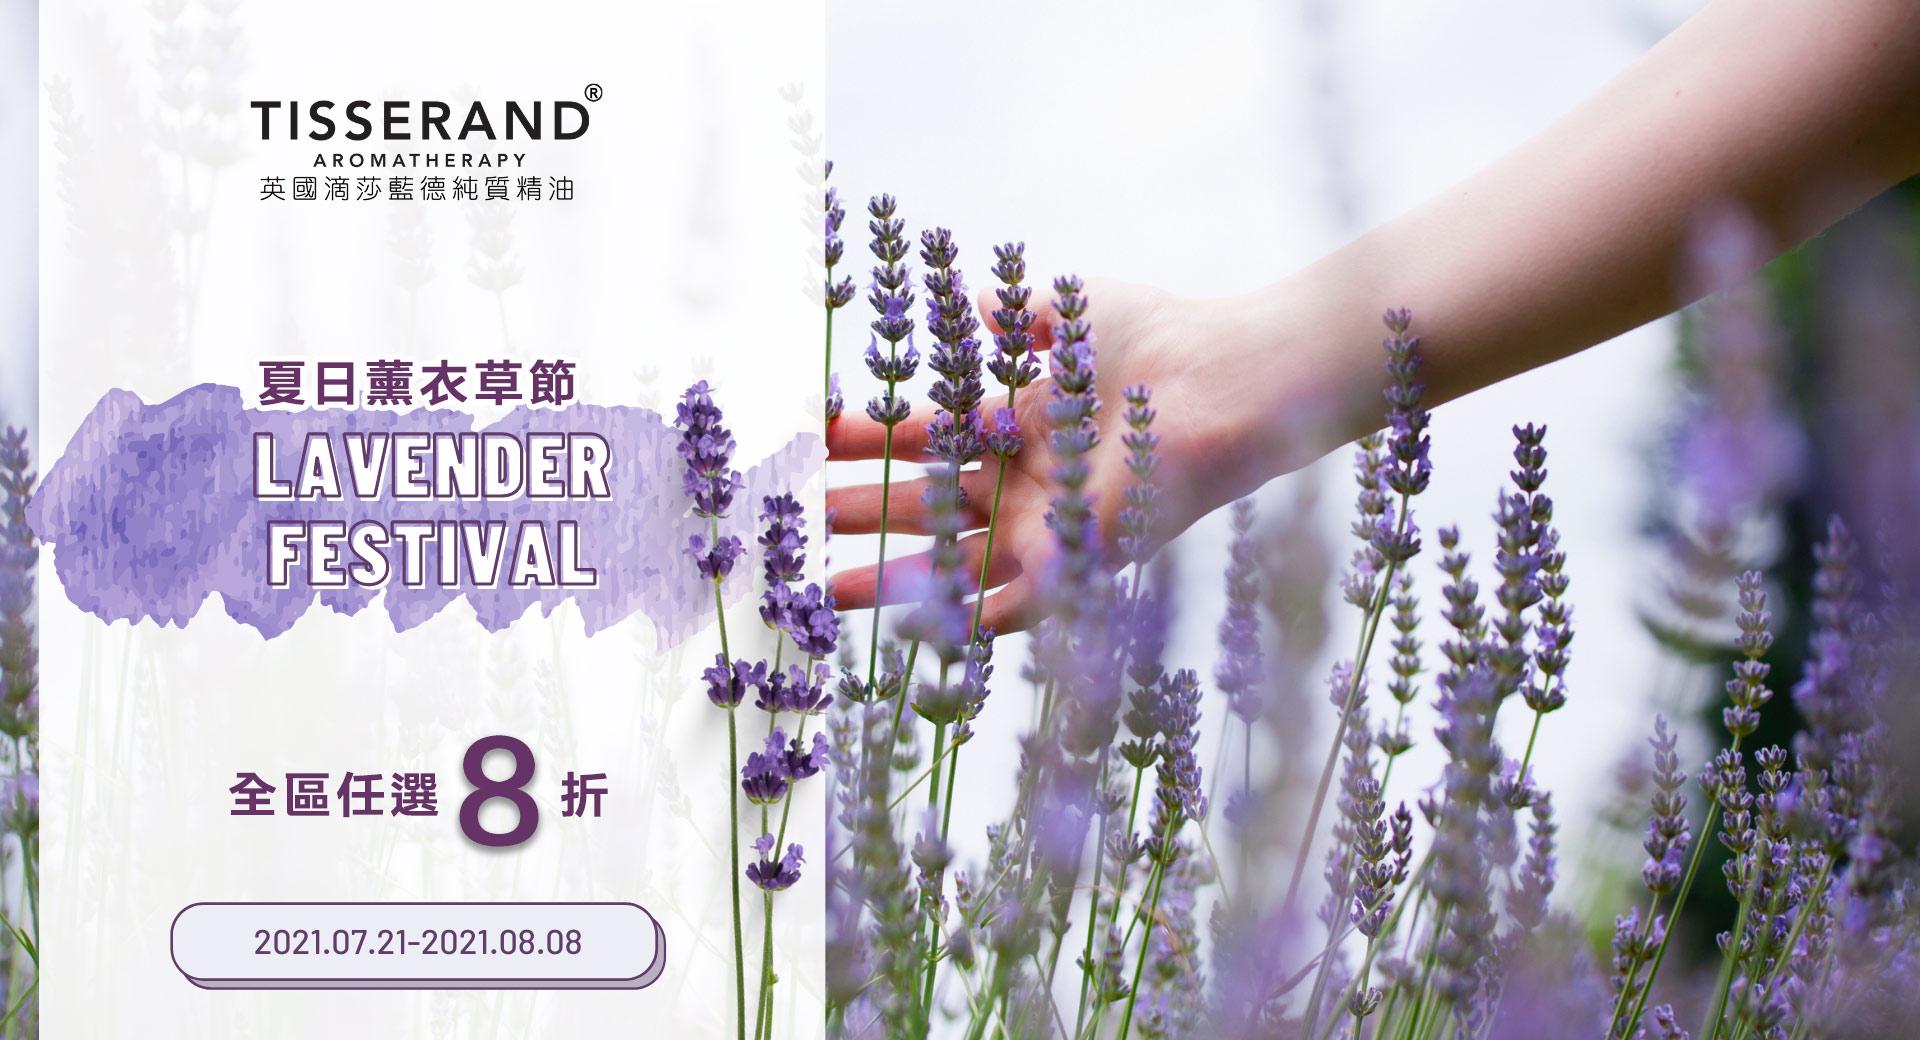 TISSERAND滴莎藍德夏日薰衣草節lavender festival全館8折